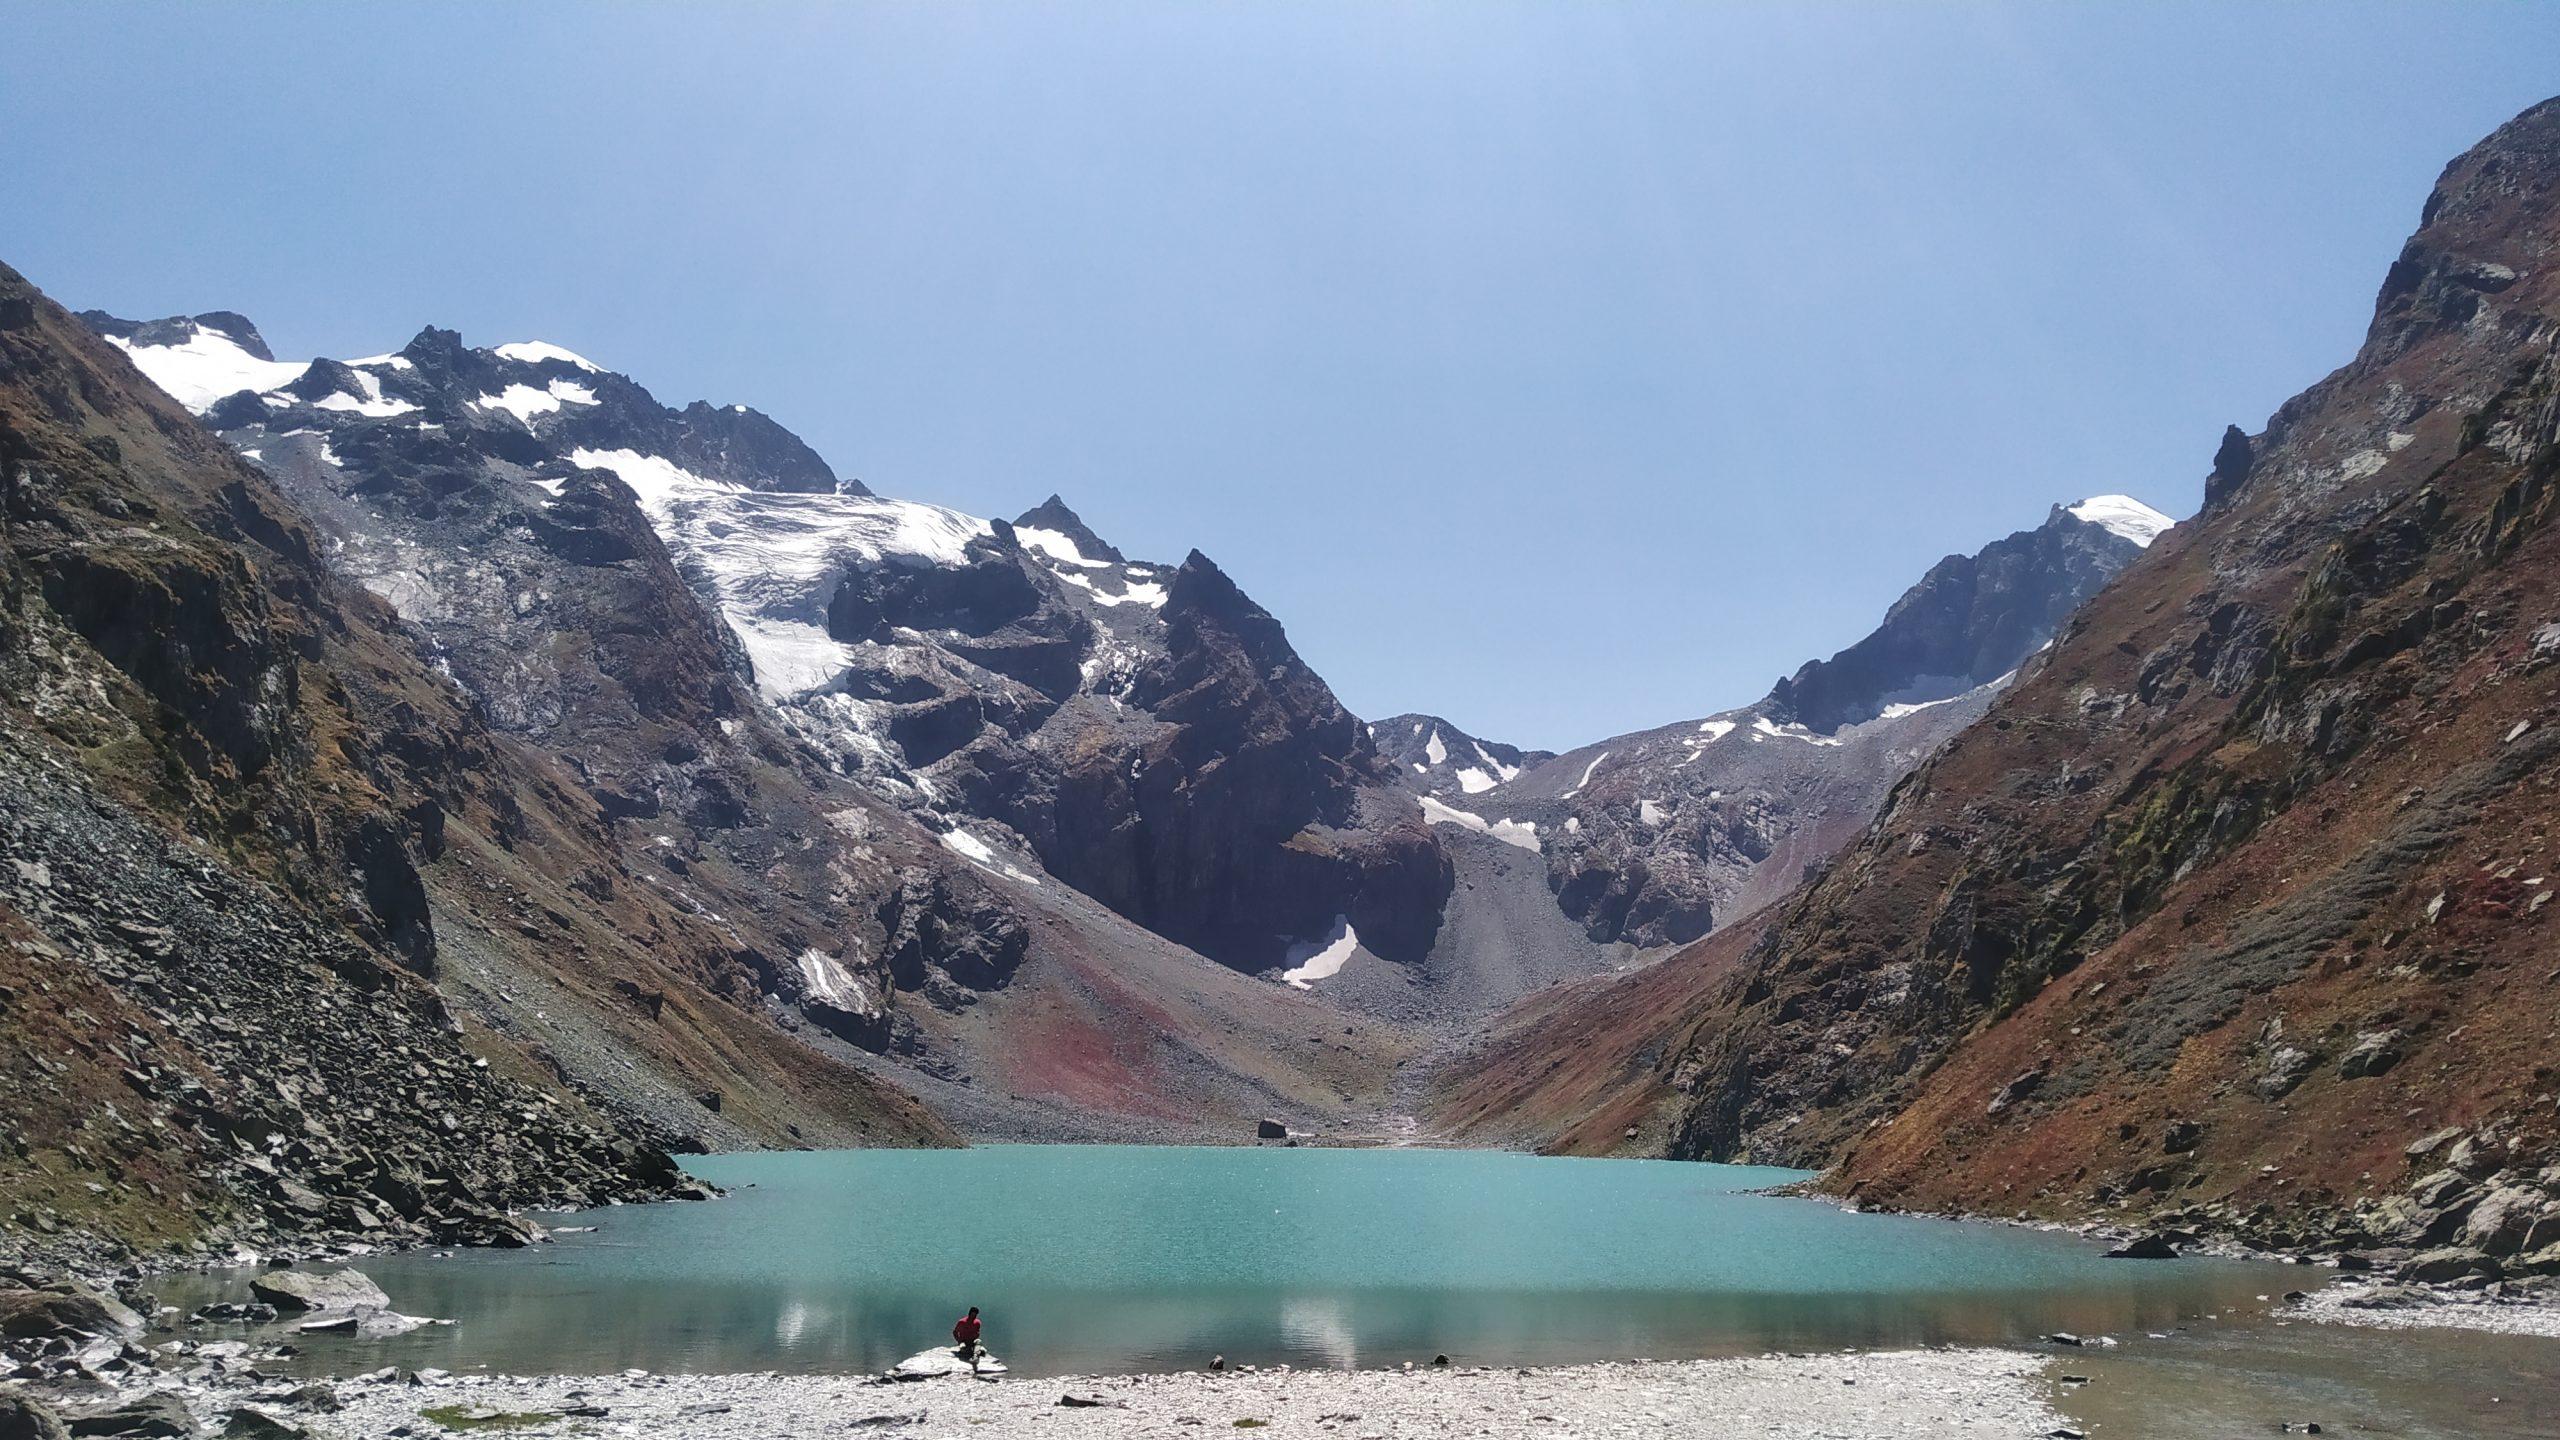 View of Sonsar Lake in Kashmir